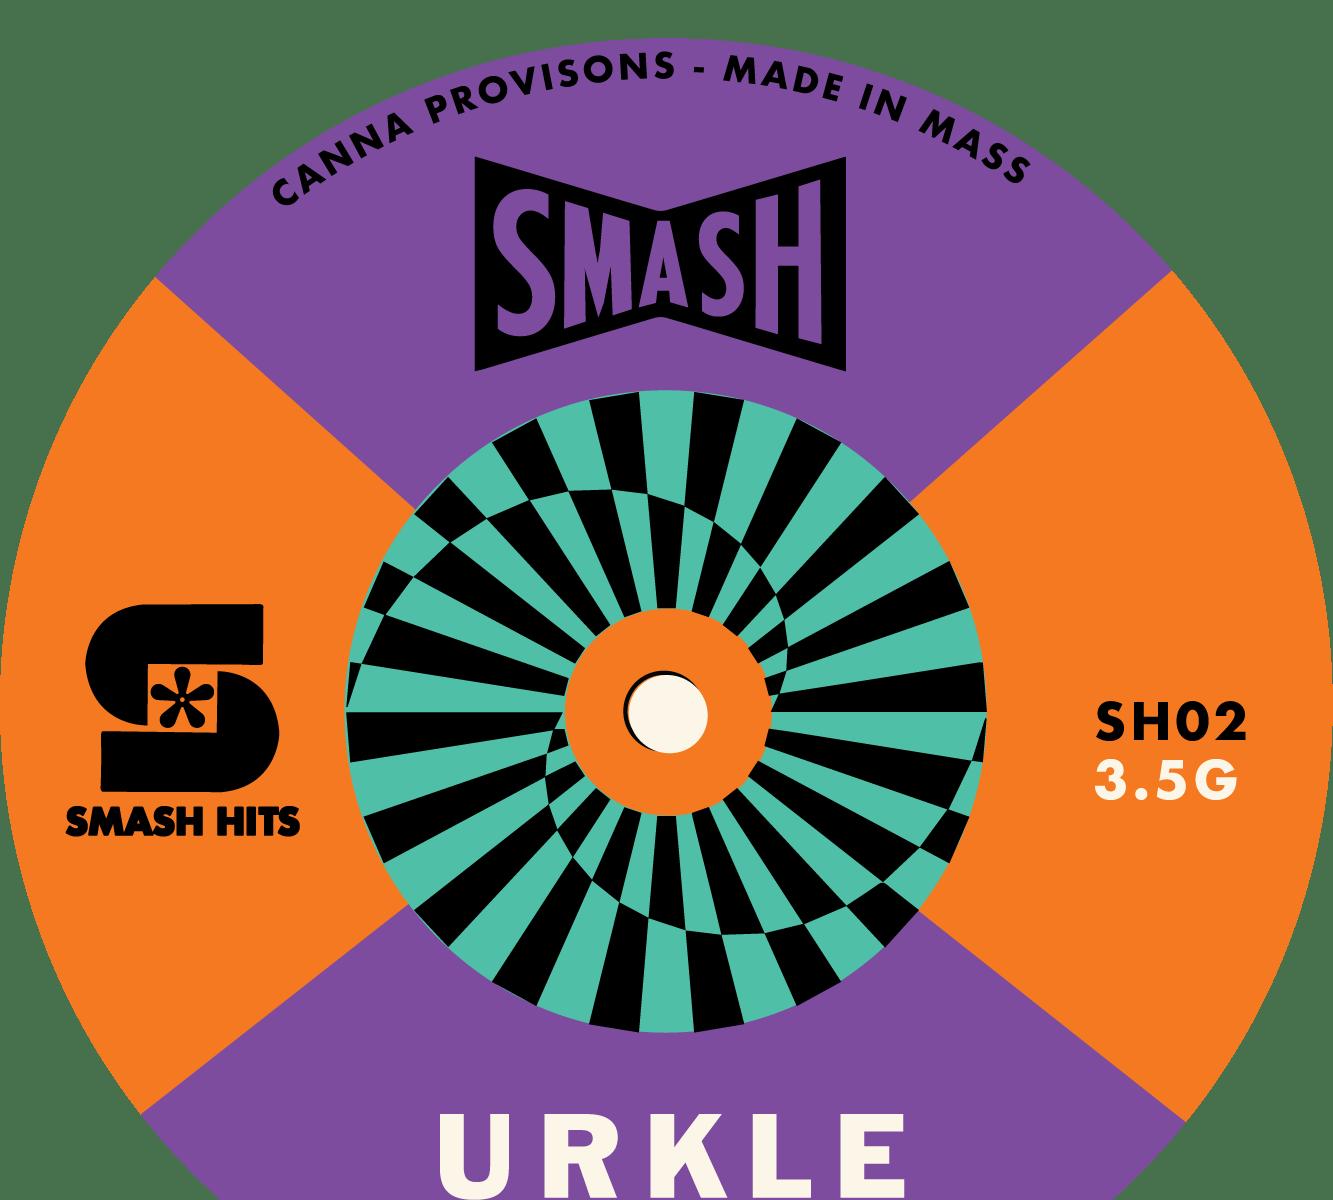 Urkle Purple Urkle smash hits chemdog canna provisions